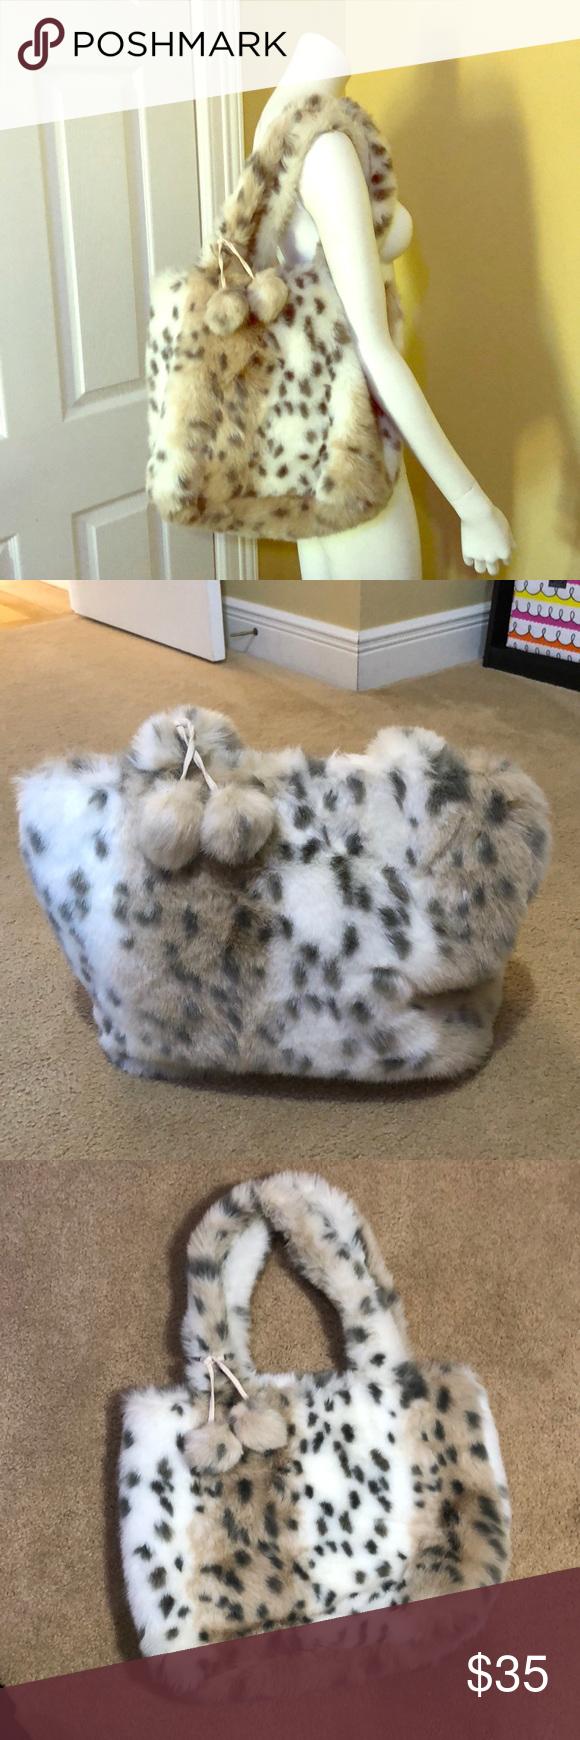 bbd69ca3a3 Pottery barn teen fur snow leopard tote bag